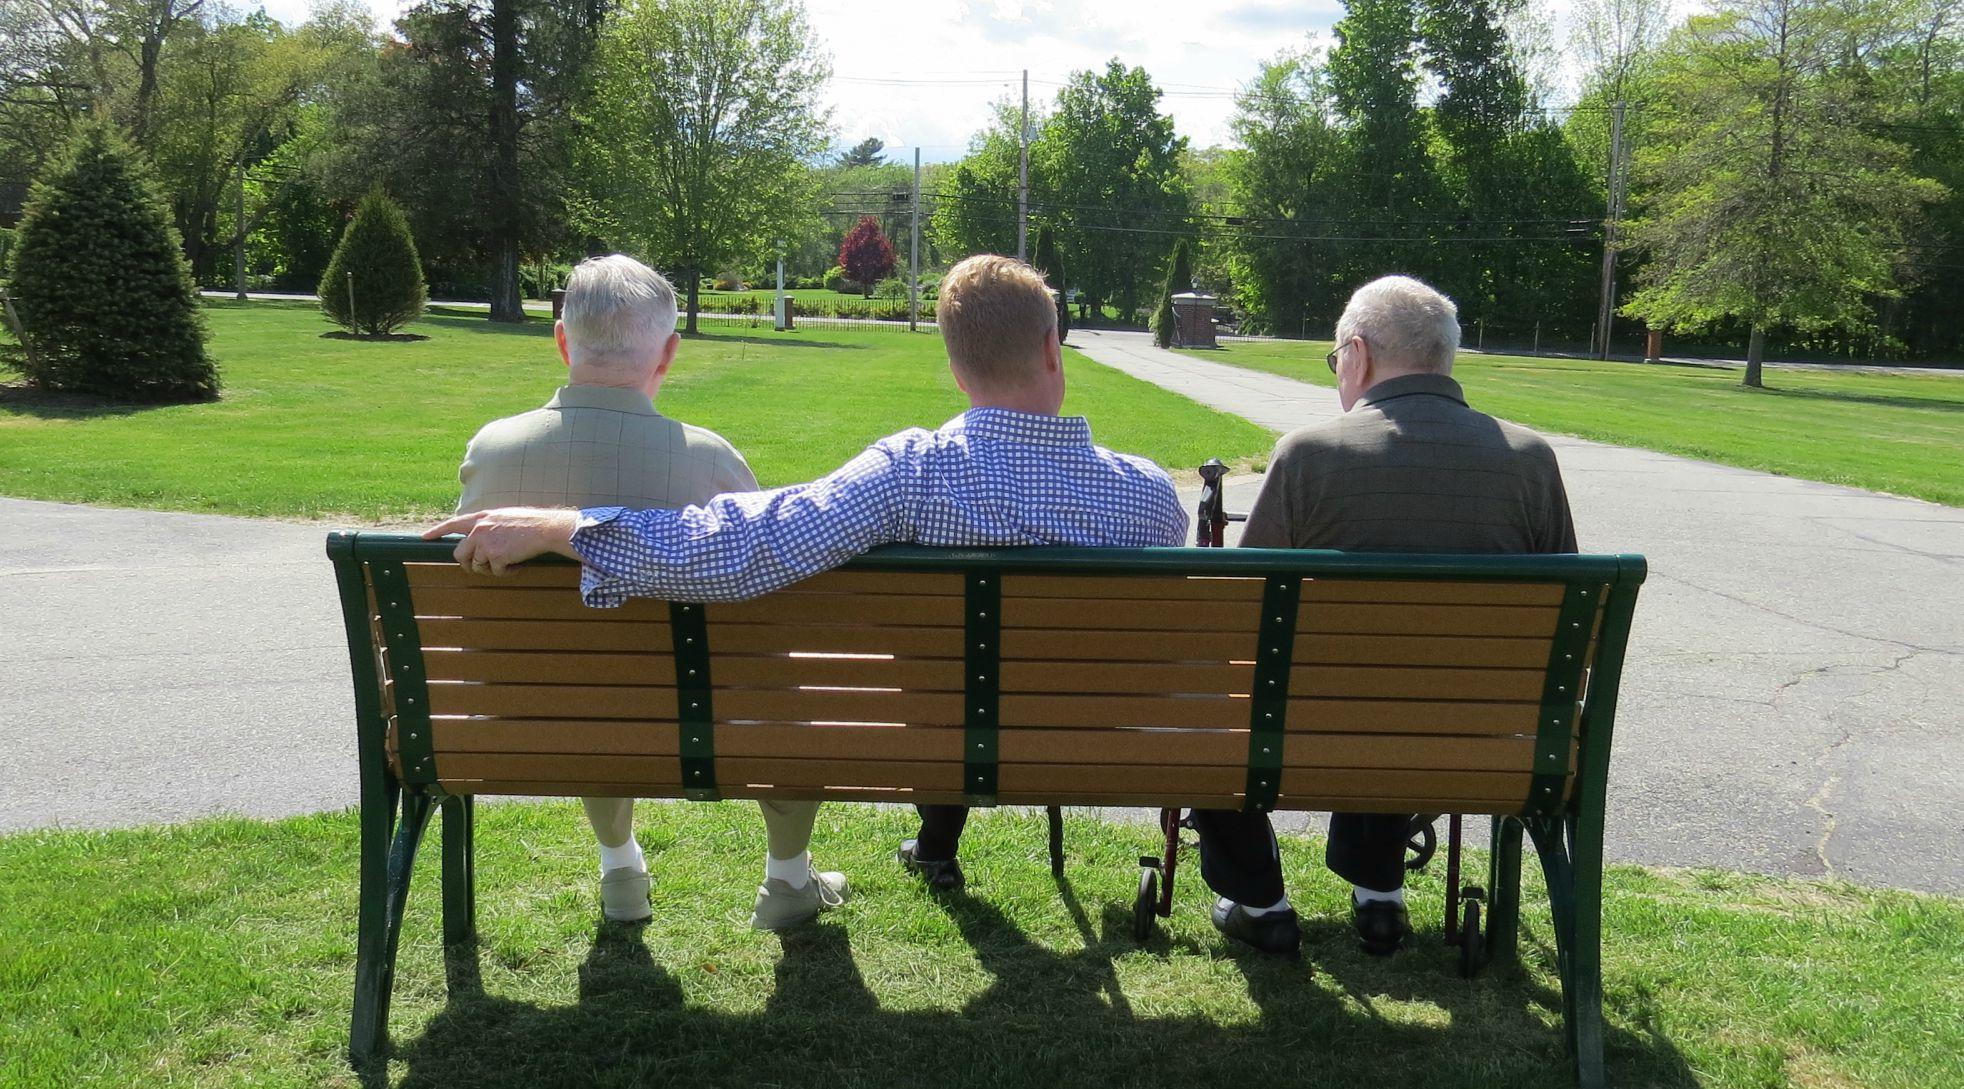 BeFunky_Clem Leary, Earl McAllister, and JohnKeeley sitting outside.jpg.jpg